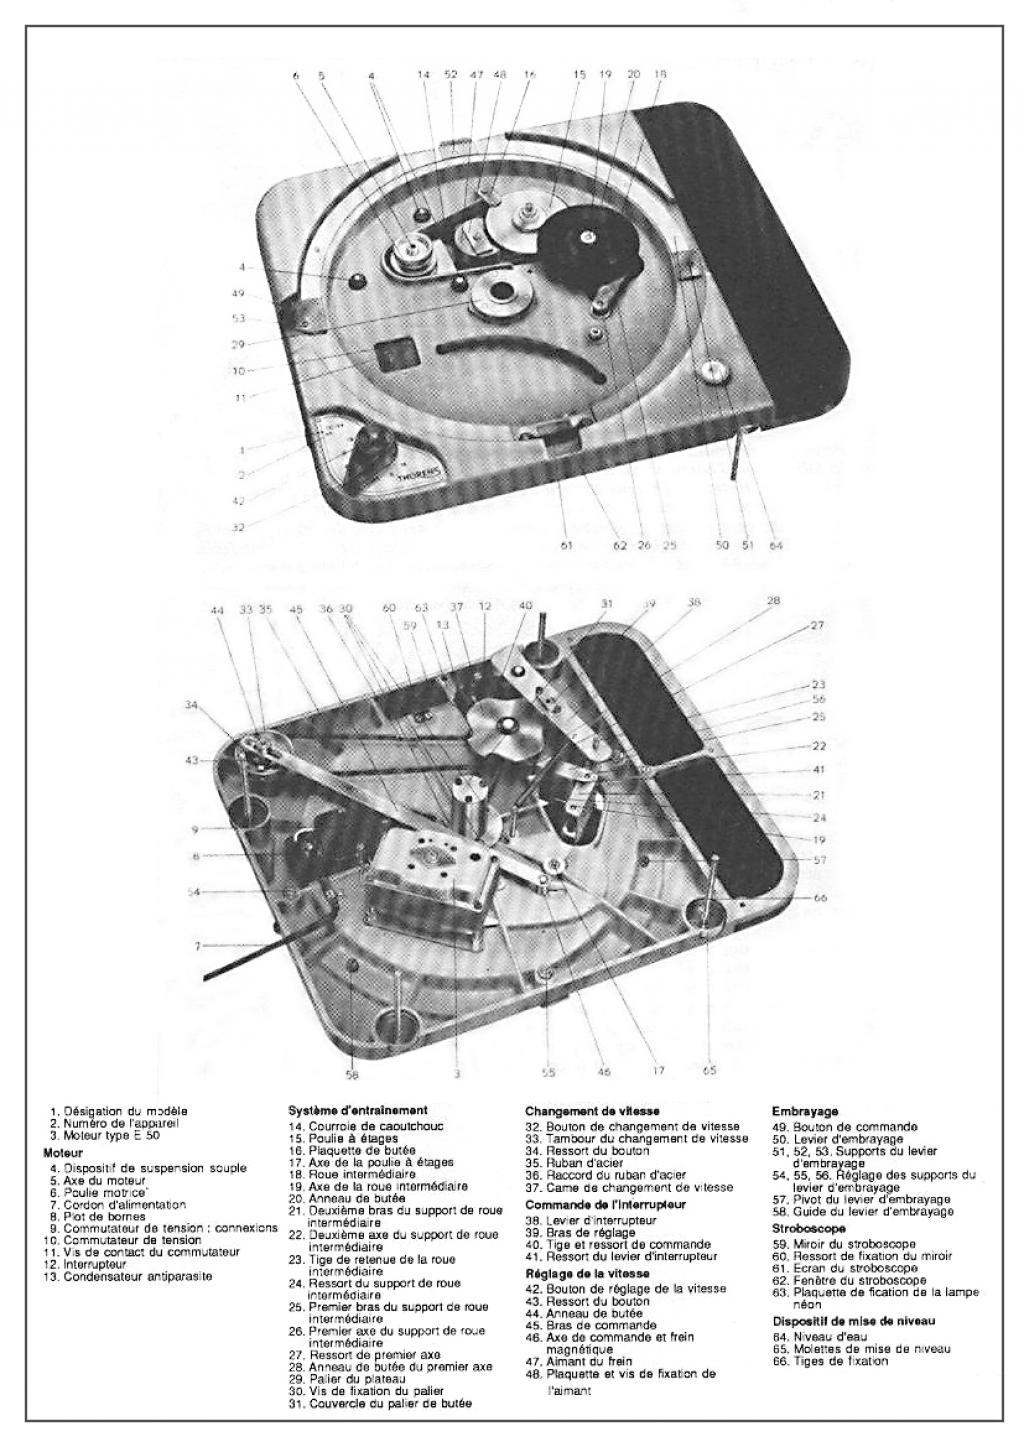 THORENS idler :: Nomenclature de la TD 124